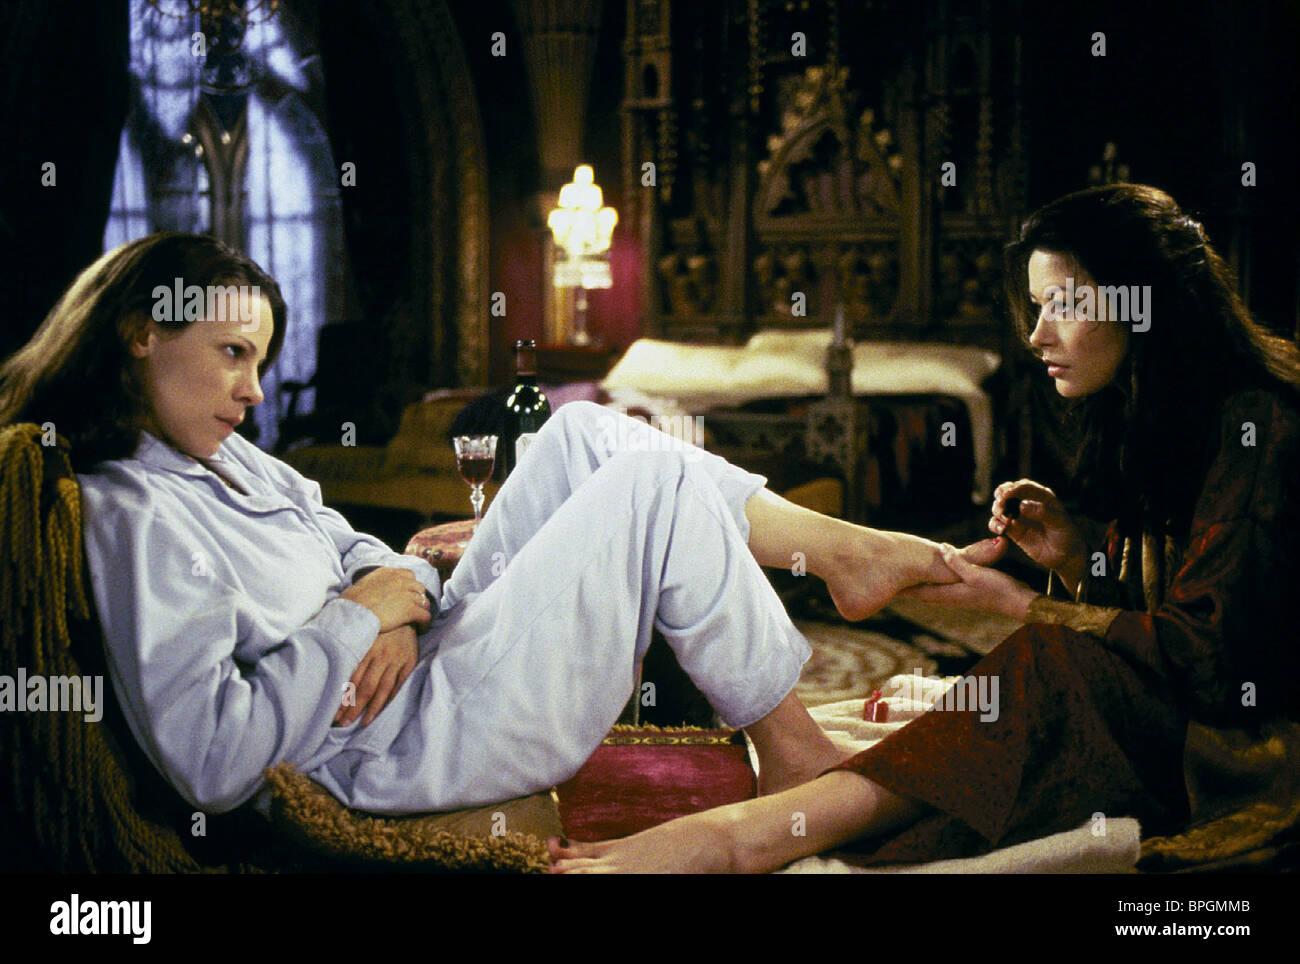 Lili Taylor Catherine Zeta Jones The Haunting 1999 Stock Photo Alamy